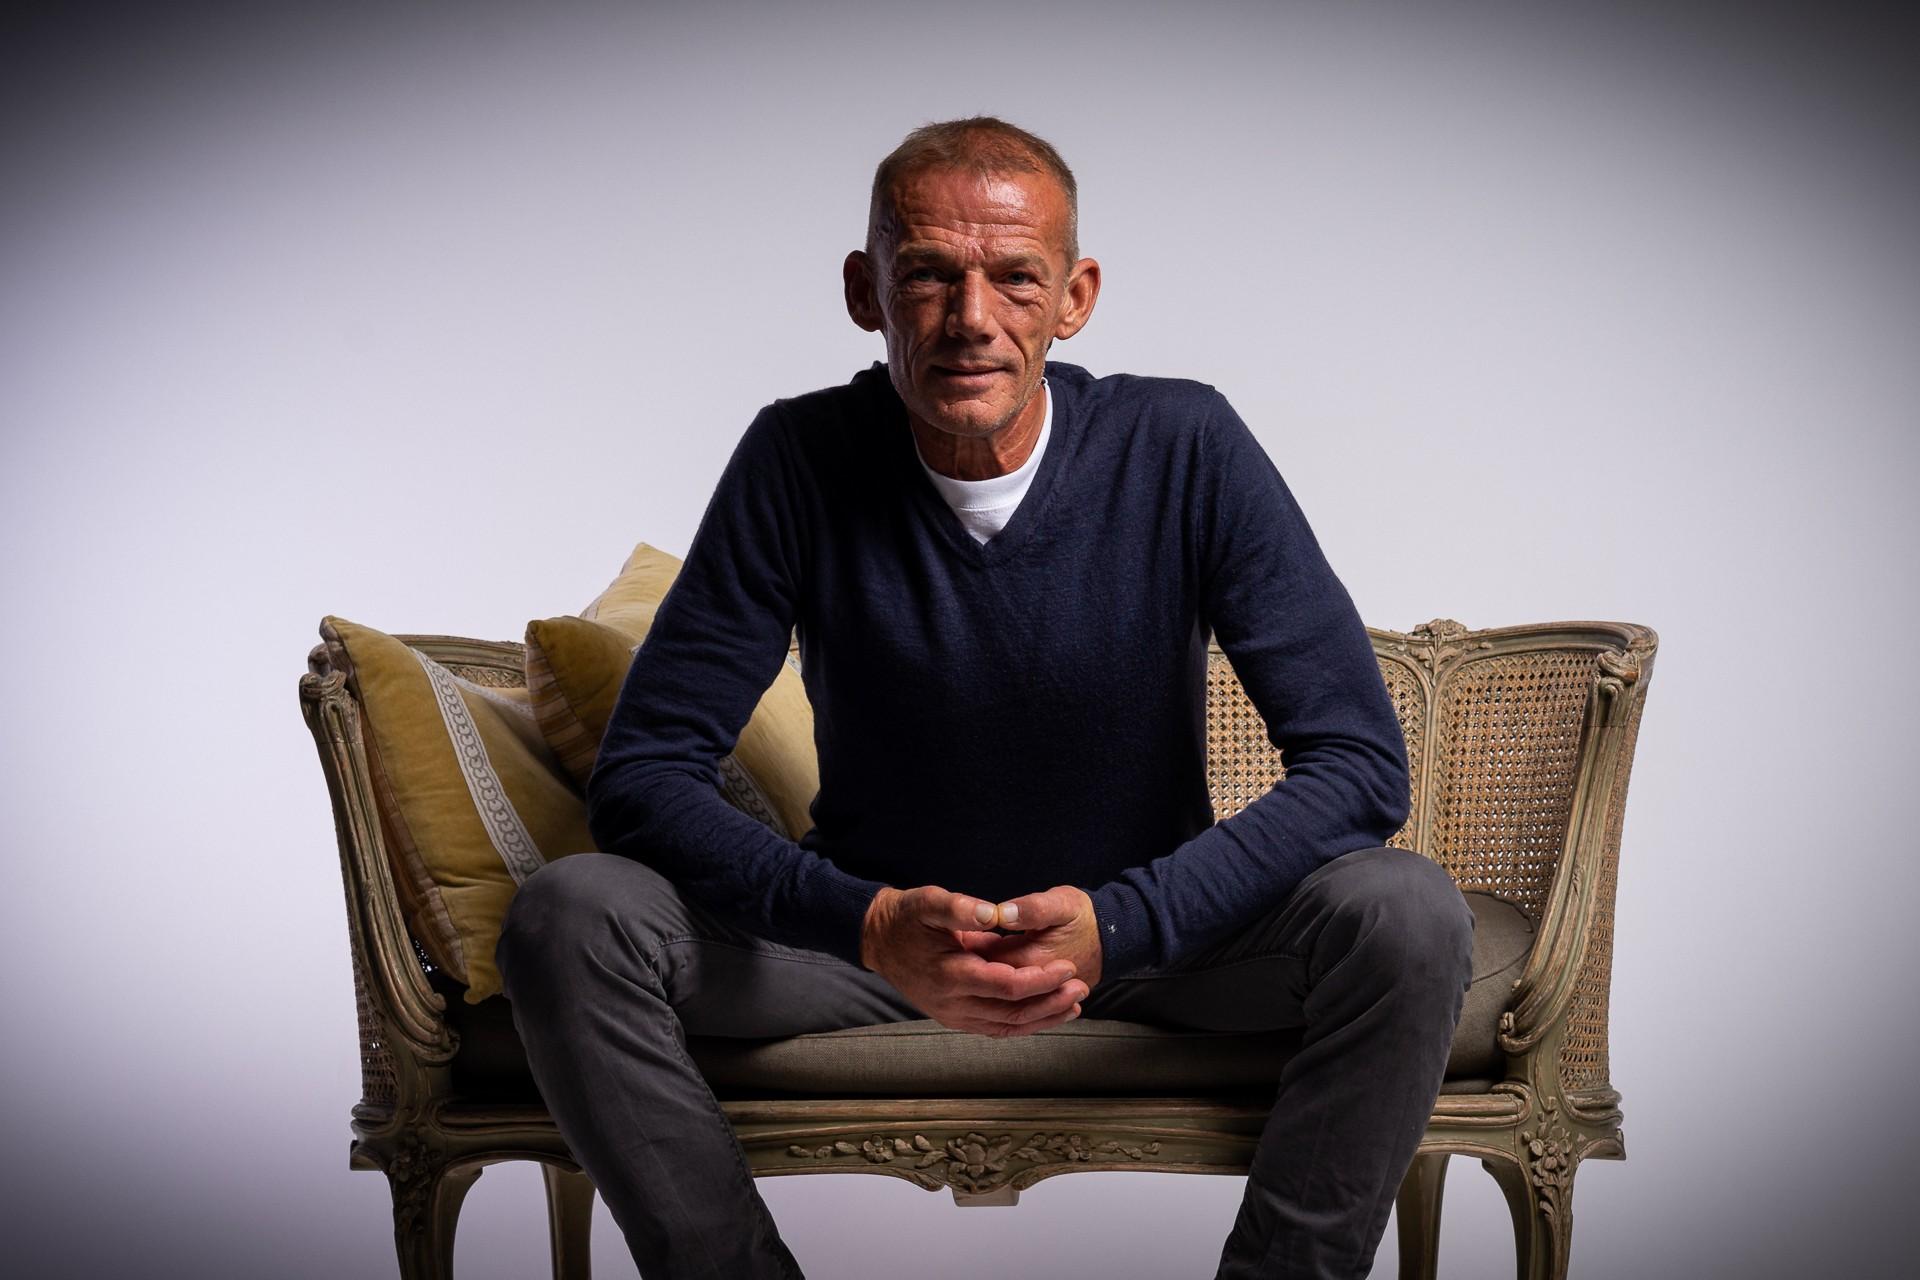 Johan Visser (56)